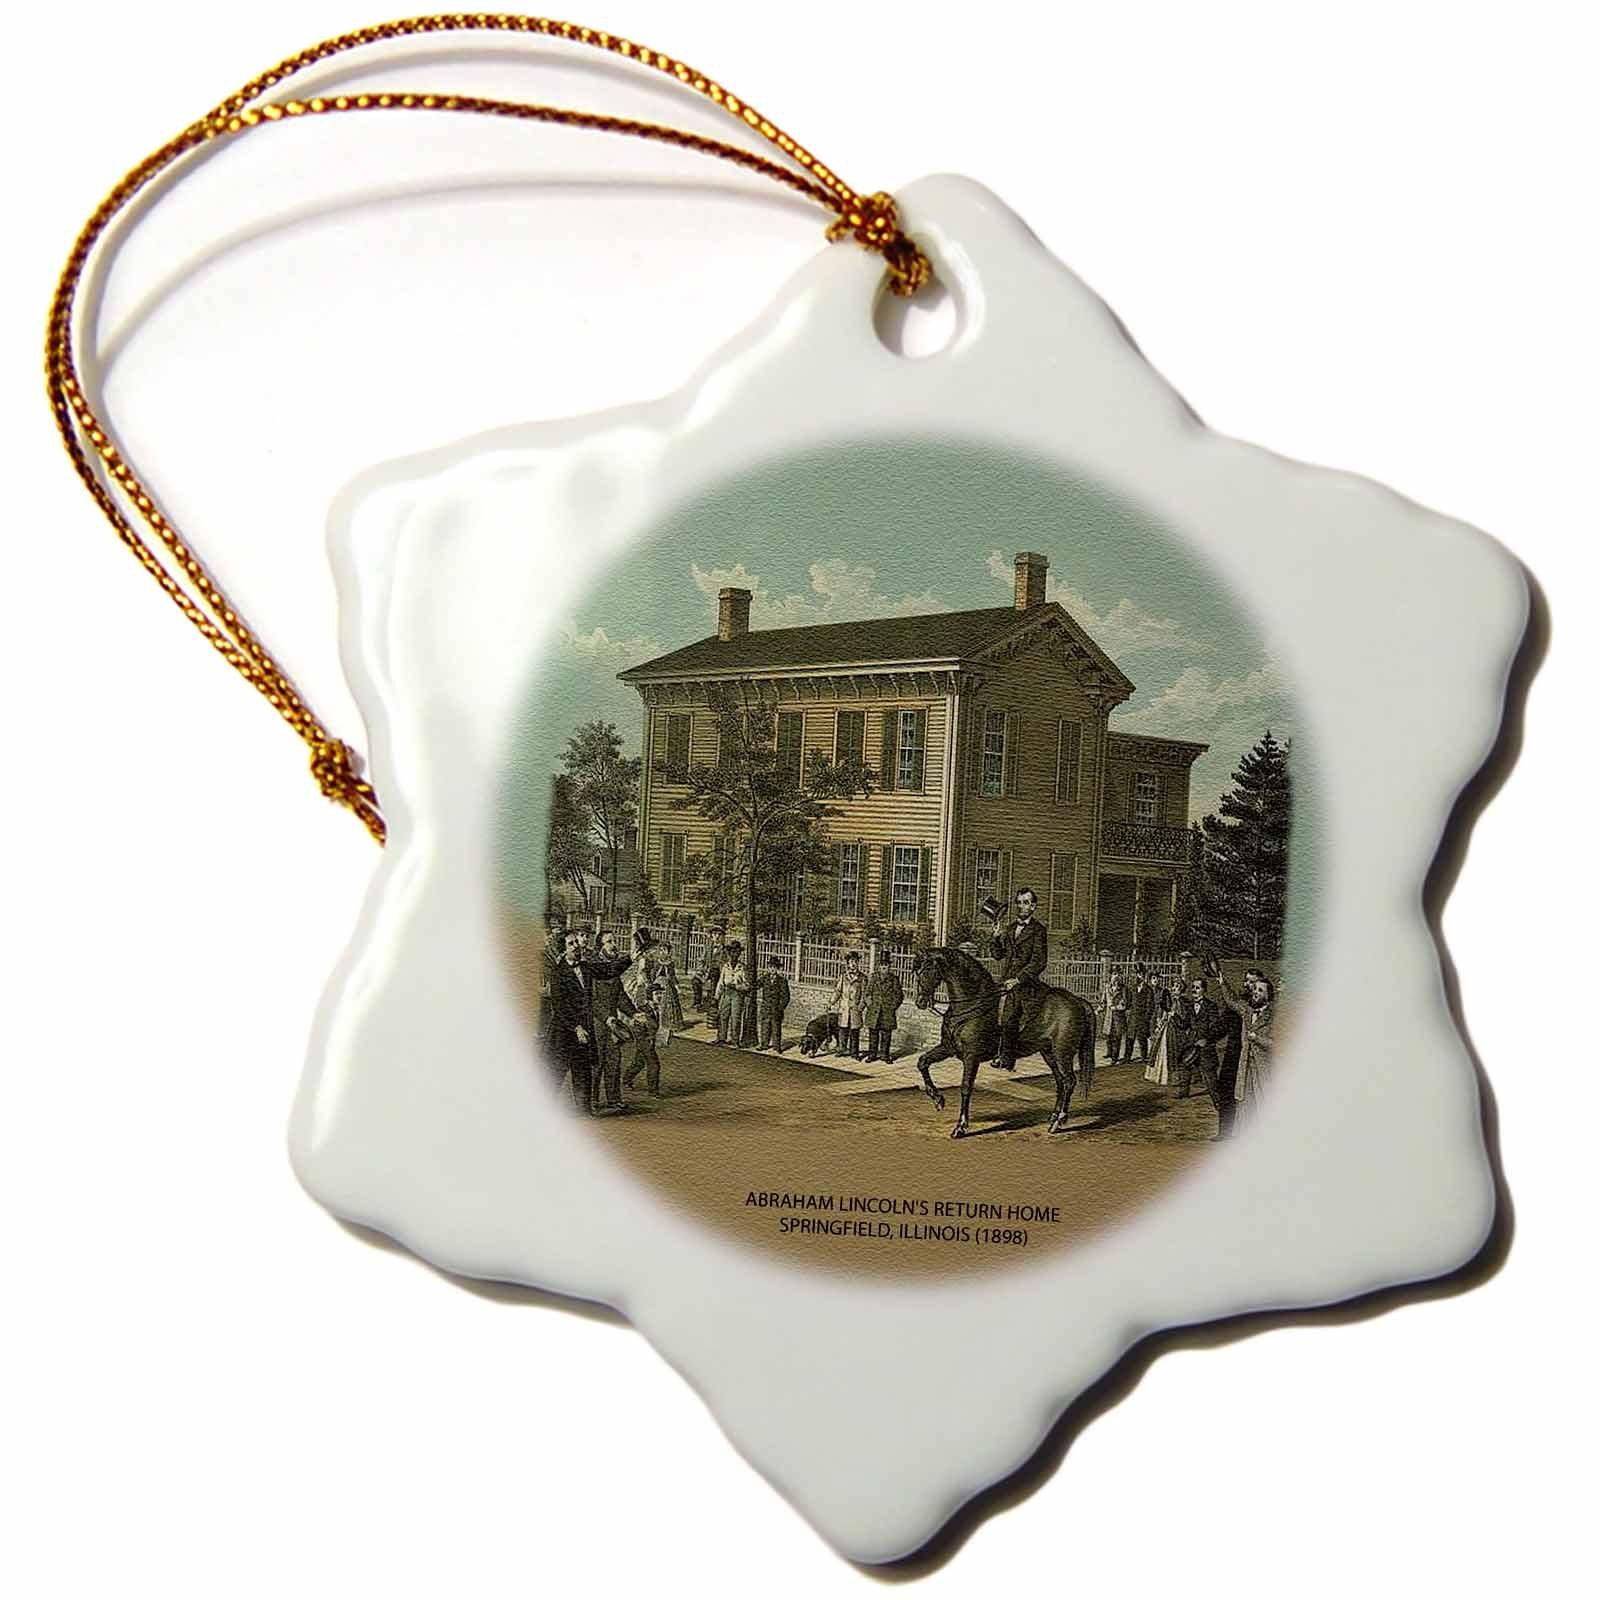 3dRose orn_55421_1 Abraham Lincolns Return Home Springfield, Illinois 1898-Snowflake Ornament, Porcelain, 3-Inch